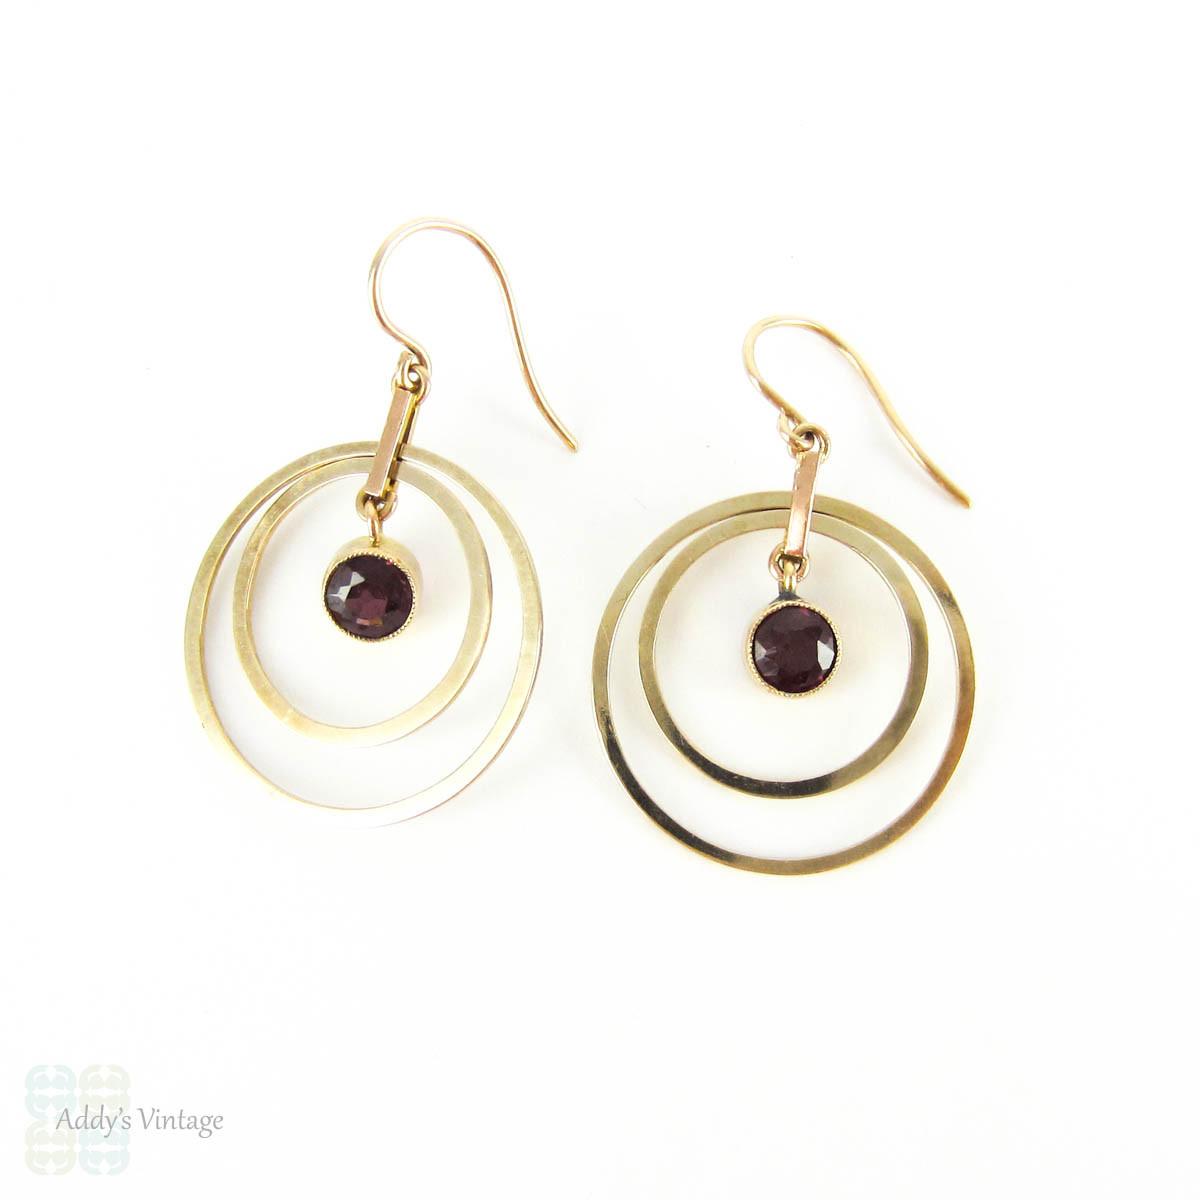 Concentric Circle Earrings: Retro Garnet 9ct Gold Earrings, Concentric Circle